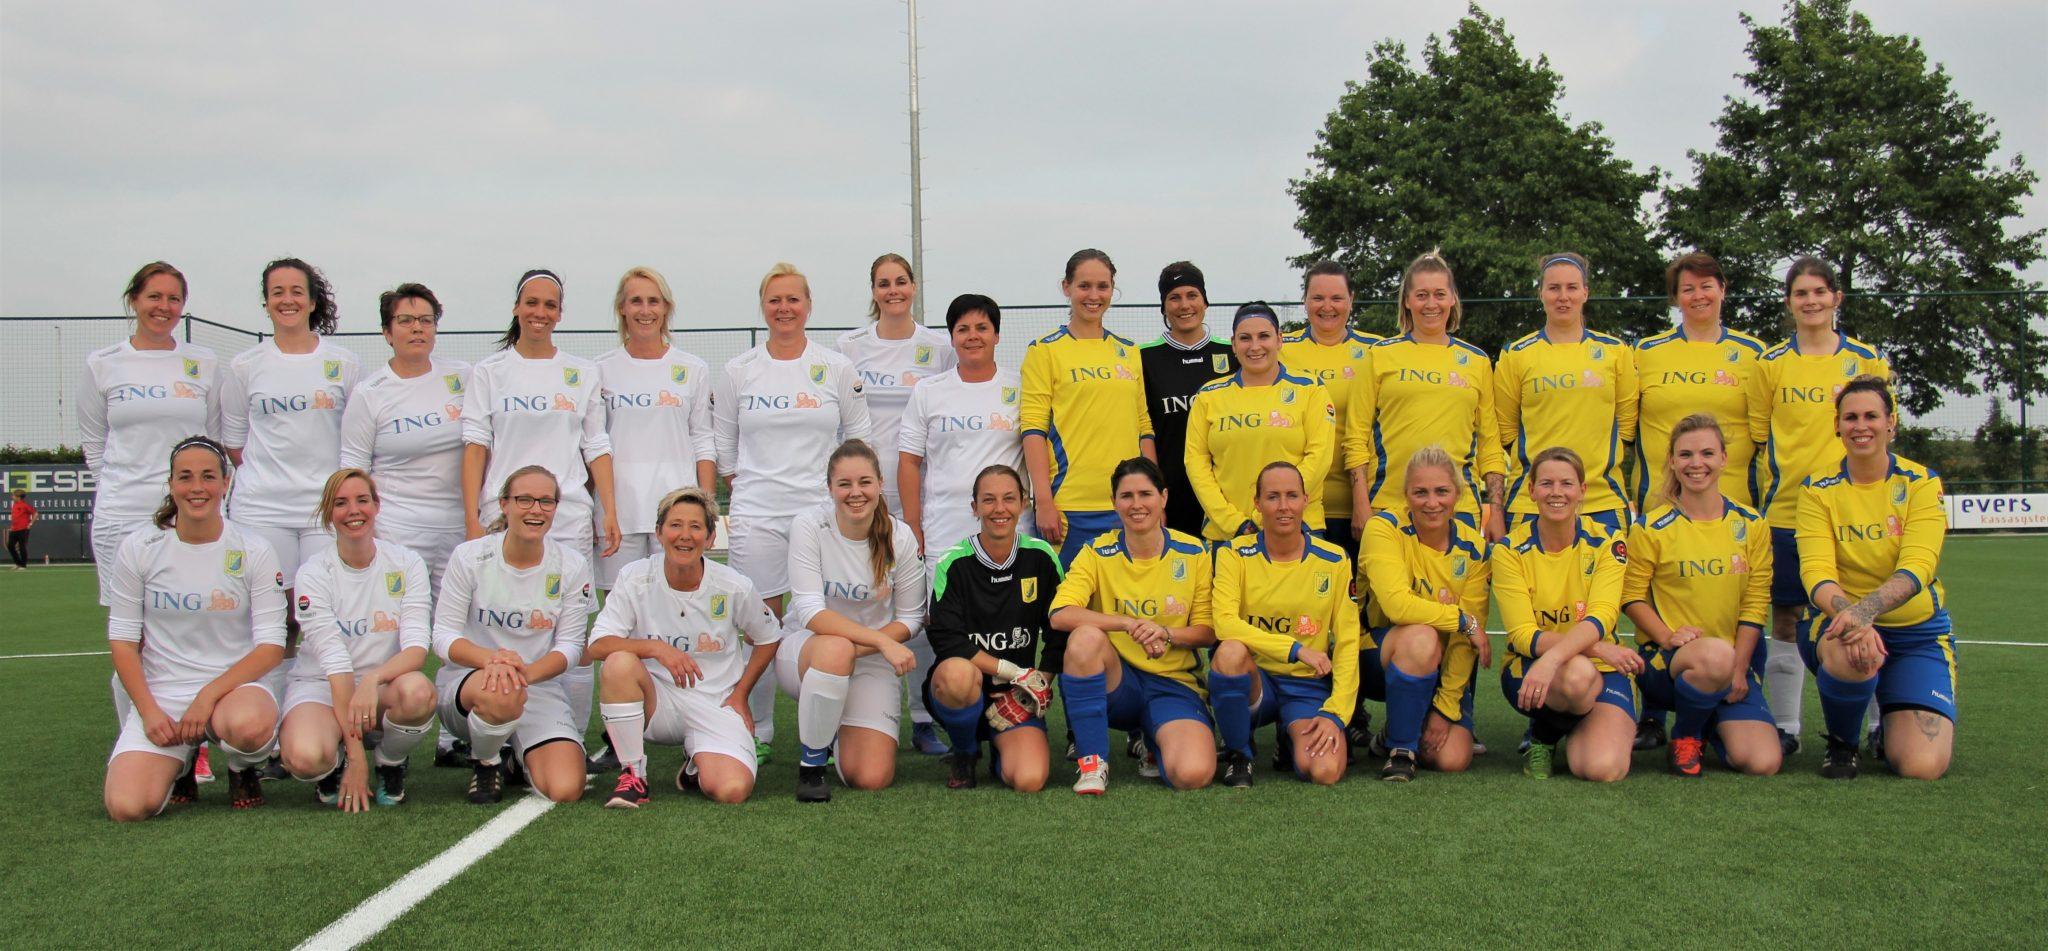 50 Jaar damesvoetbal in Empel